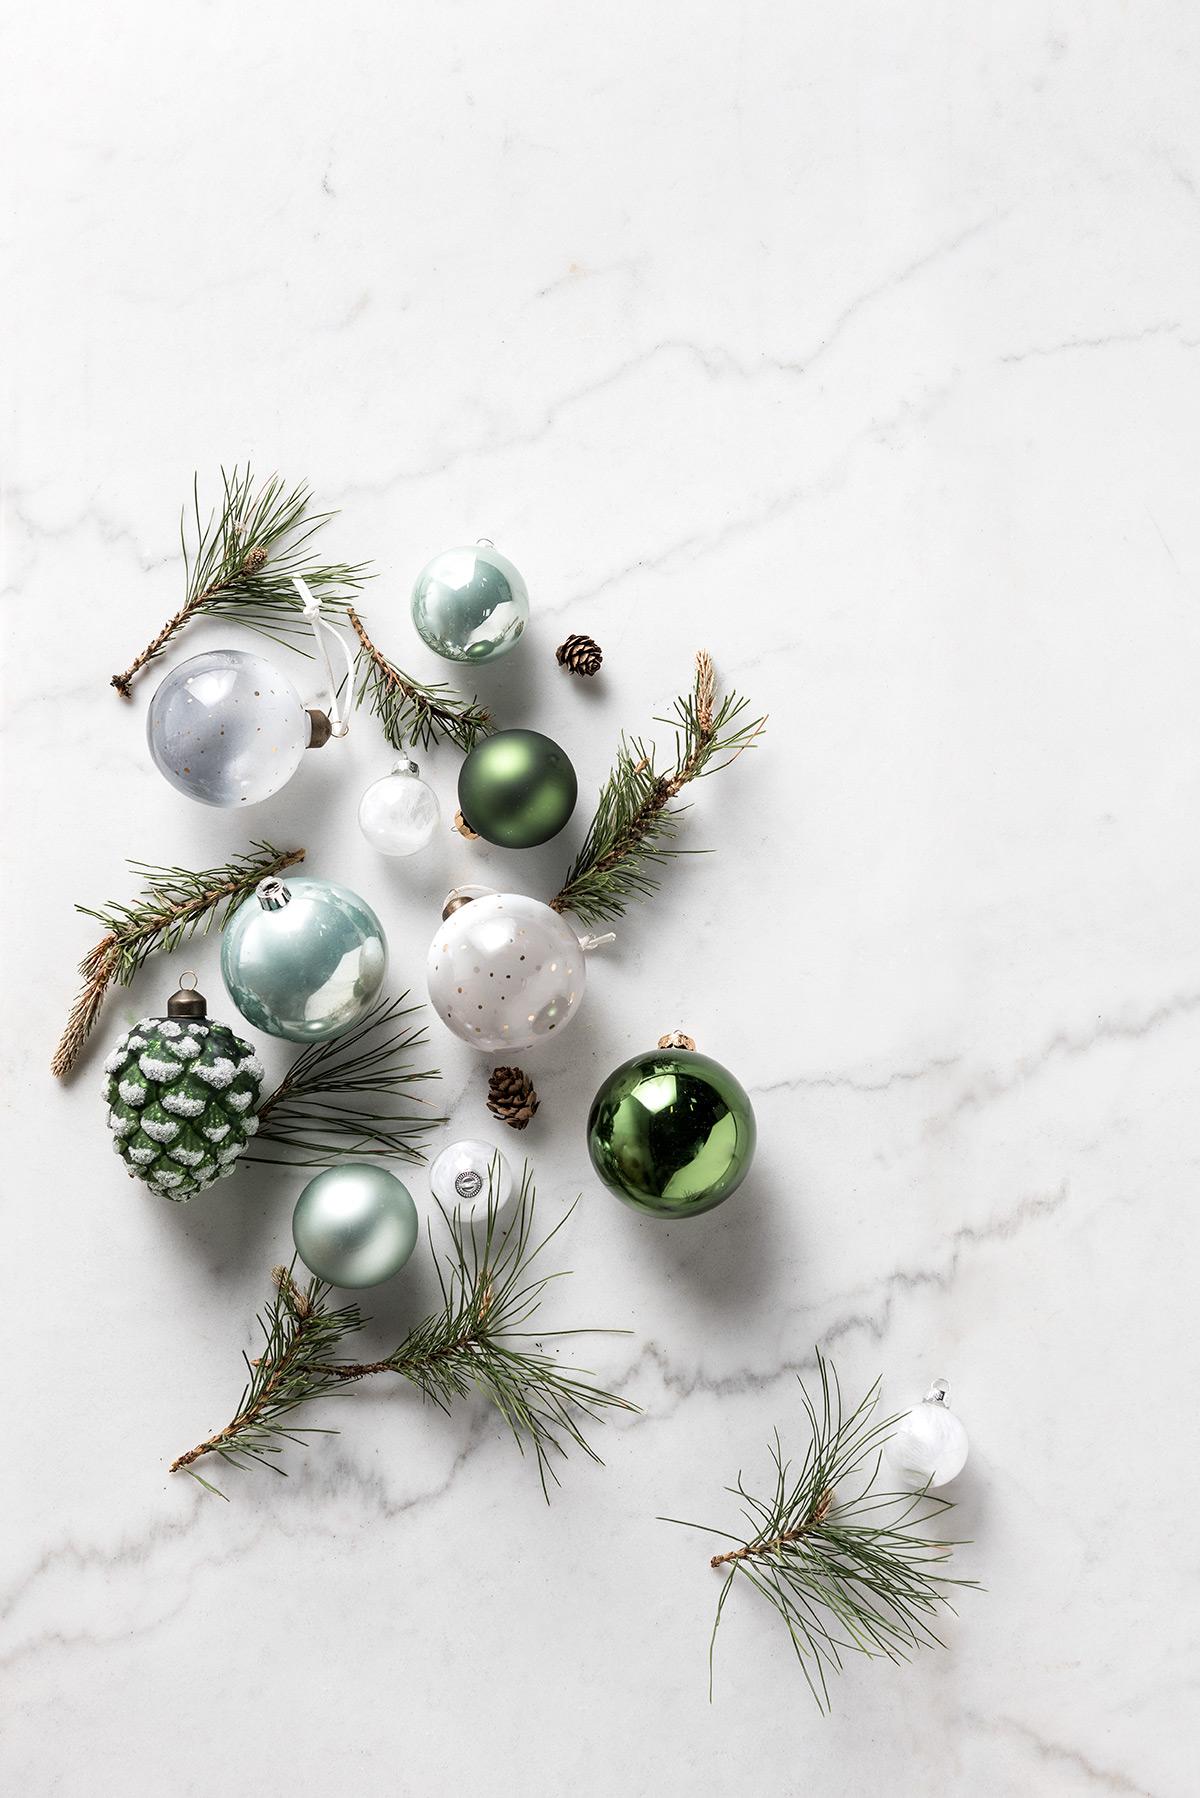 Karwei warm decembergevoel kerstboom versieren